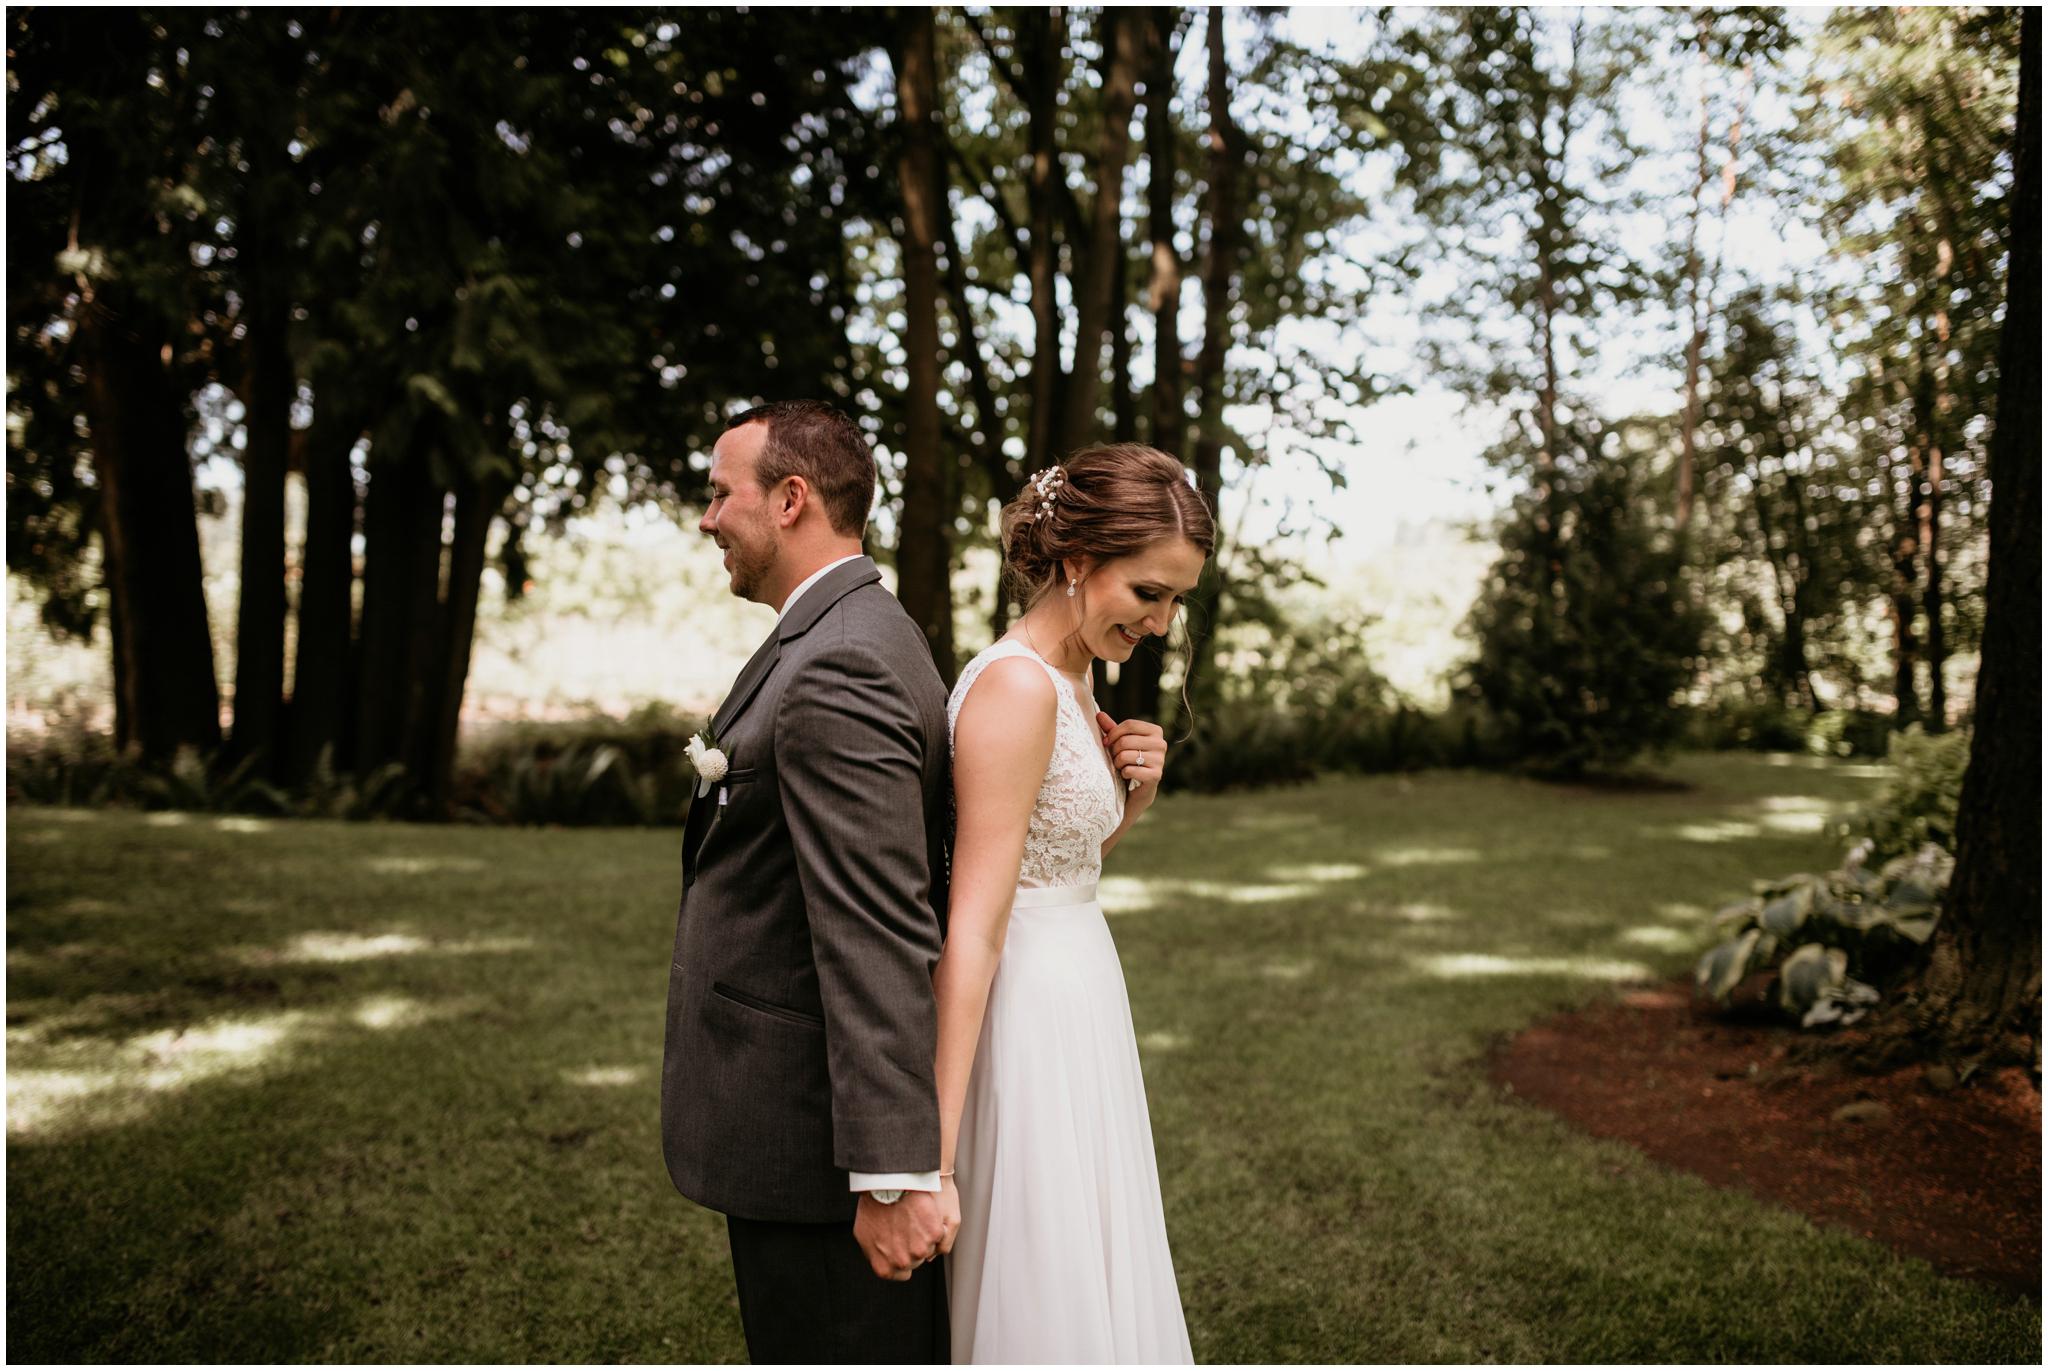 erin-and-tyler-evergreen-gardens-bellingham-wedding-photographer-029.jpg